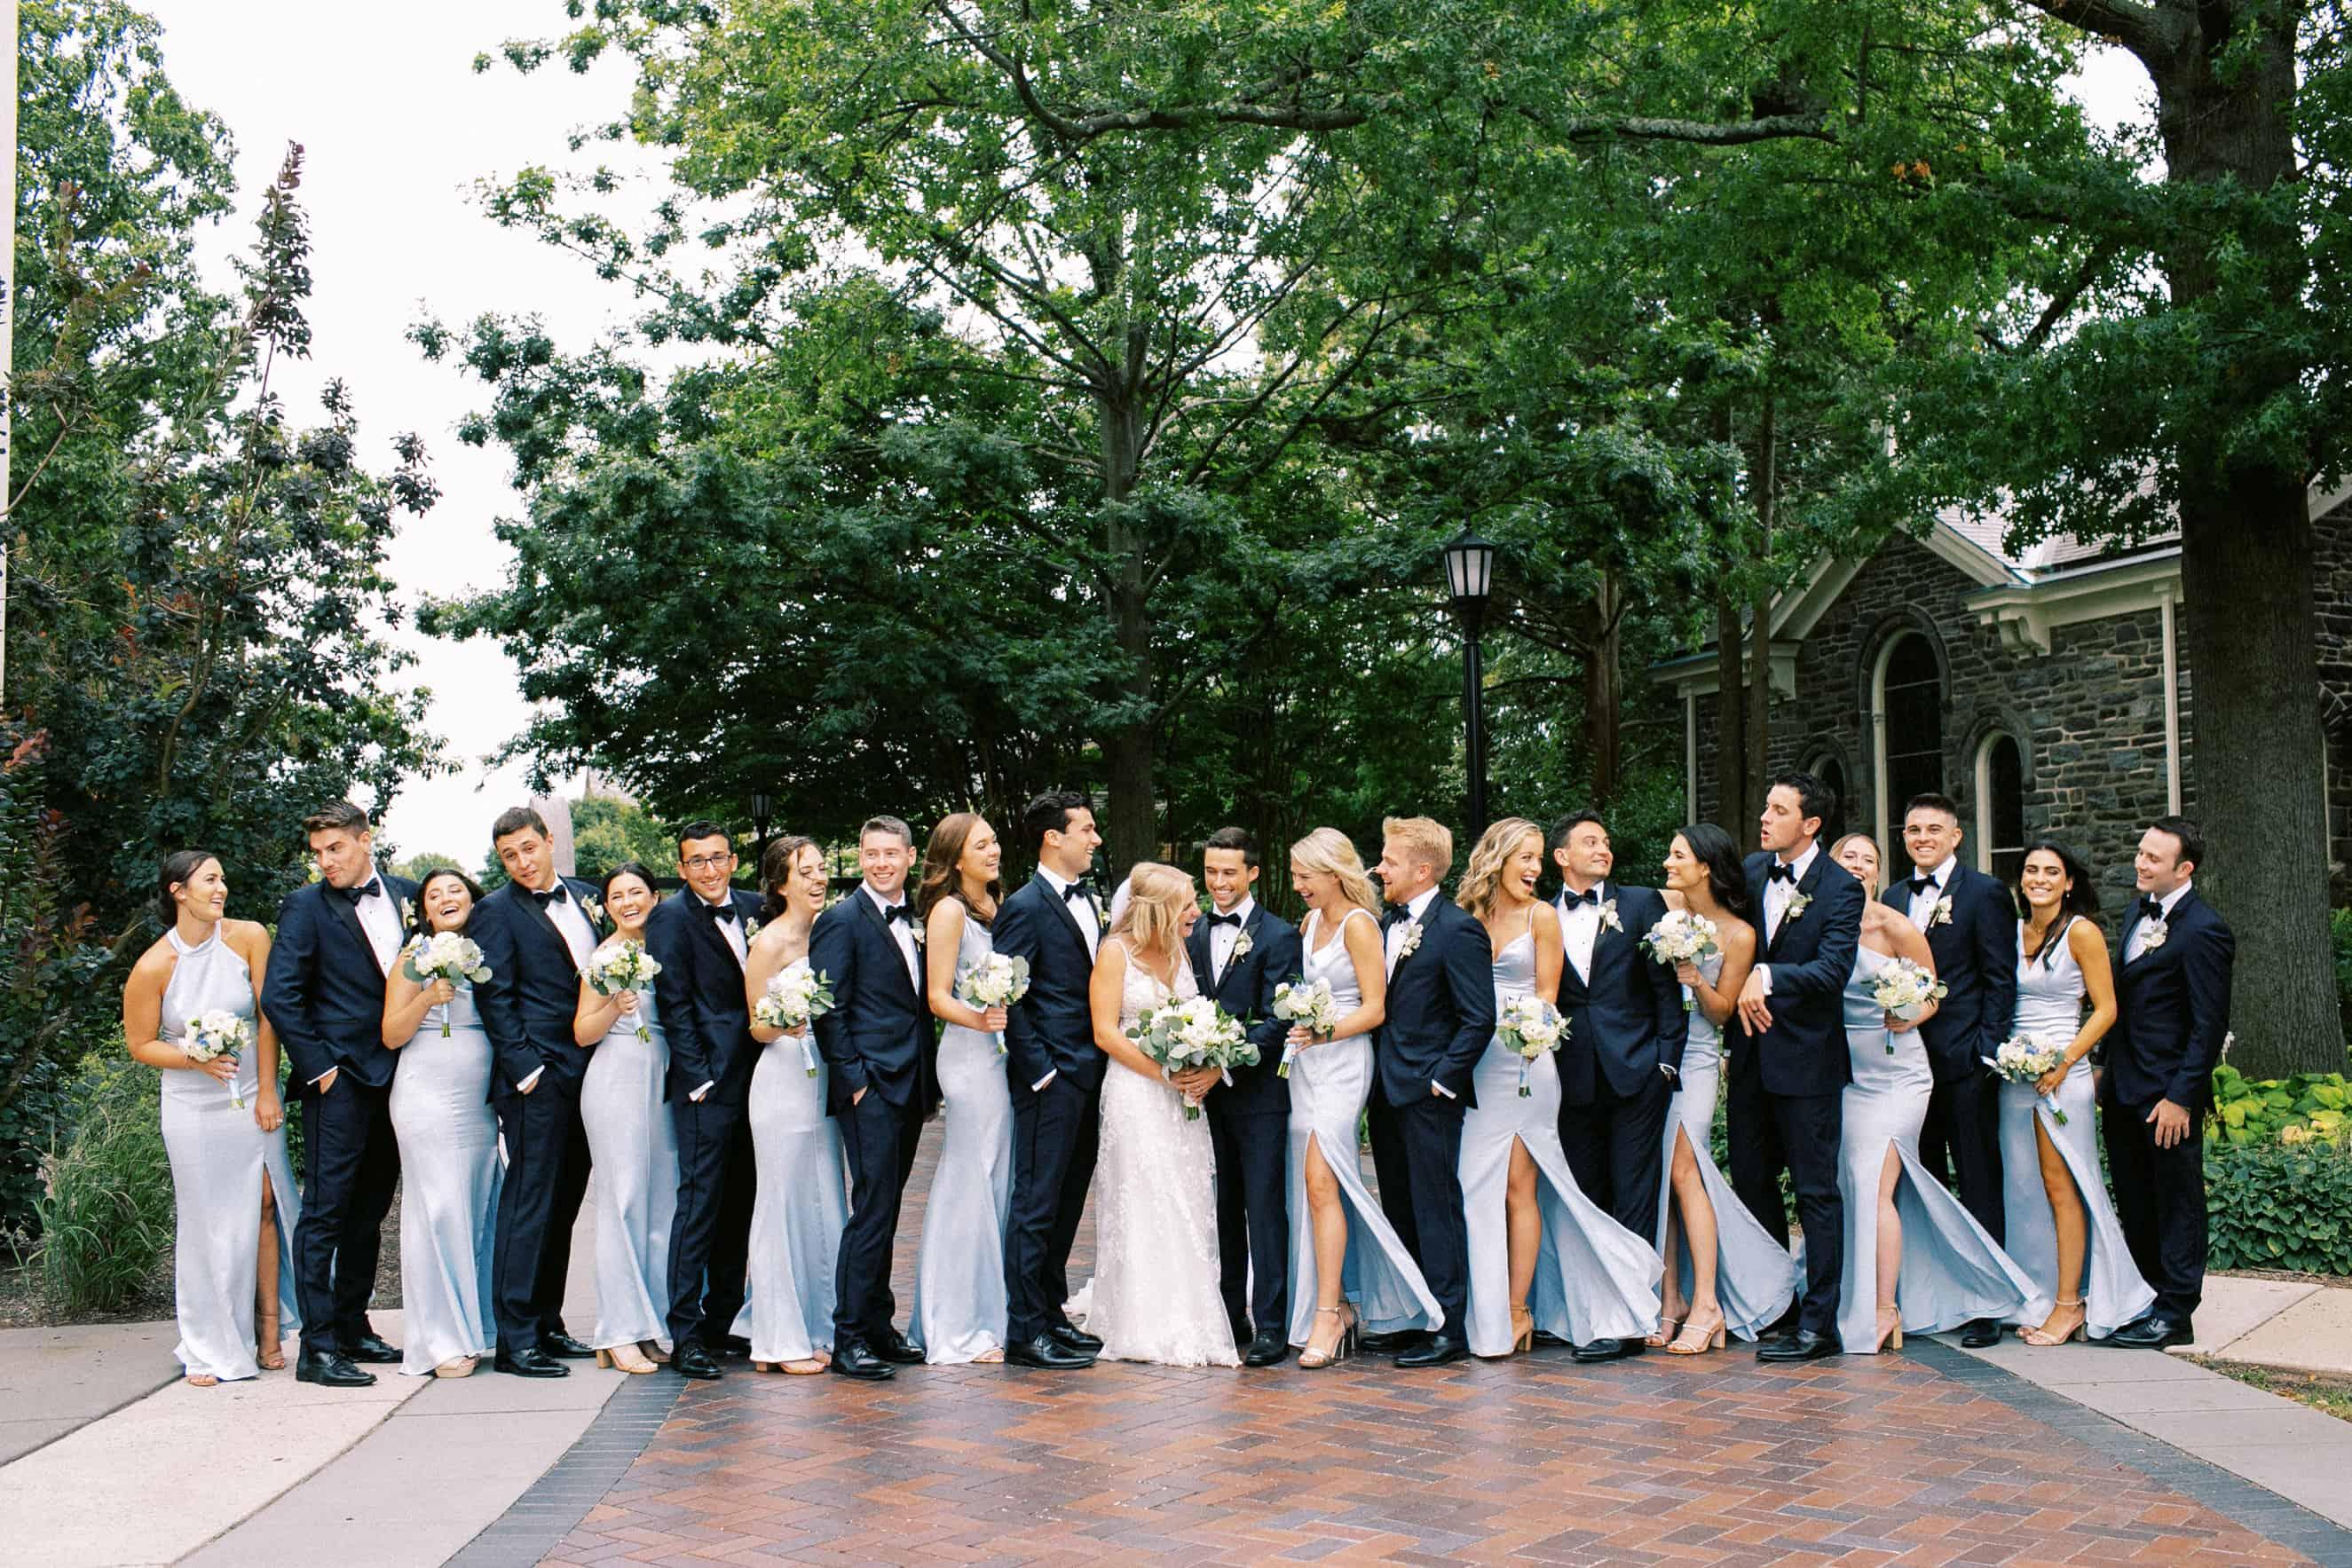 Villanova university Wedding Party